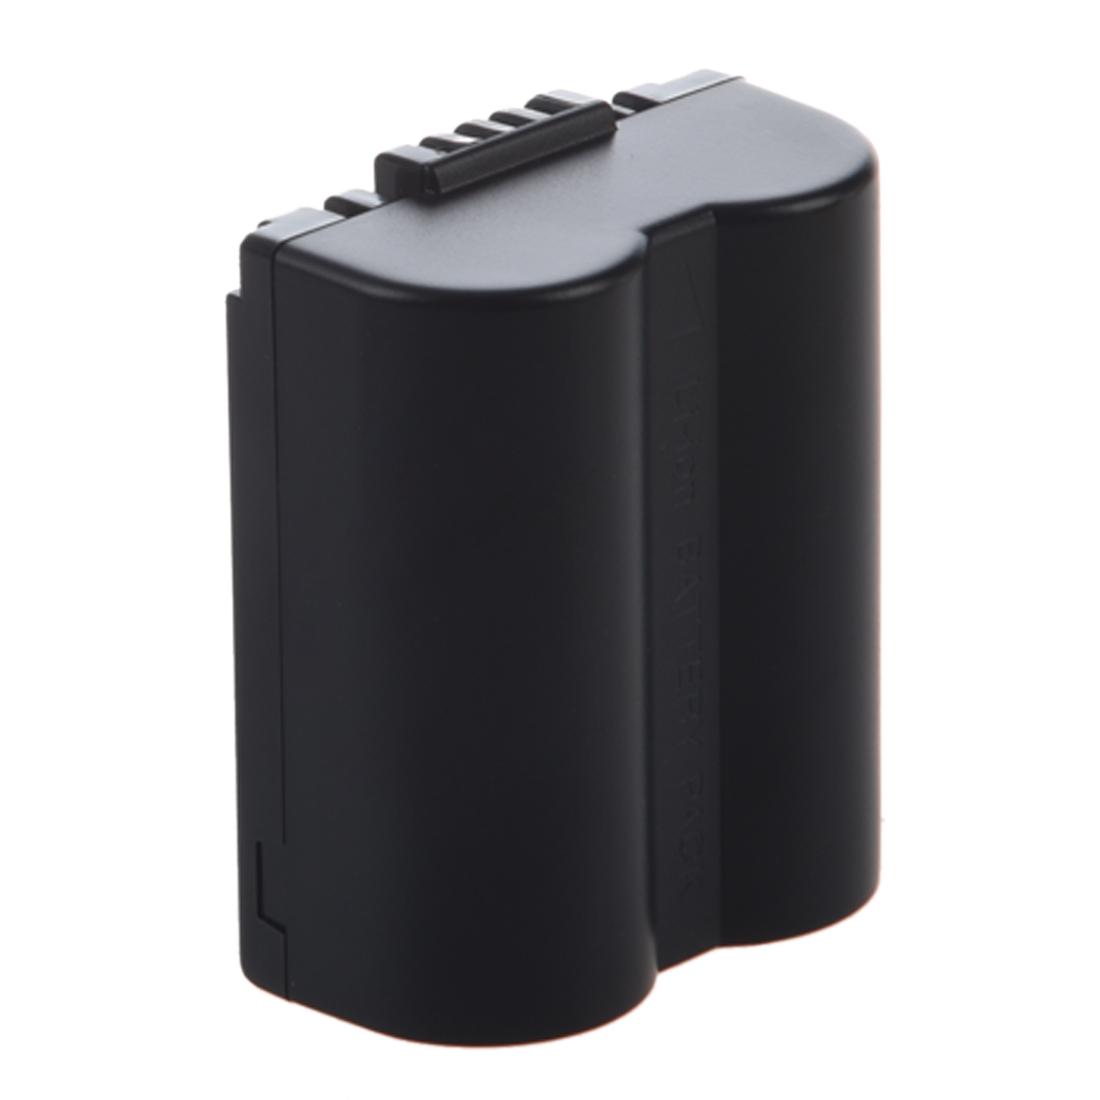 2x cgr s006a battery for panasonic dmc fz50 fz7 fz30 fz28. Black Bedroom Furniture Sets. Home Design Ideas